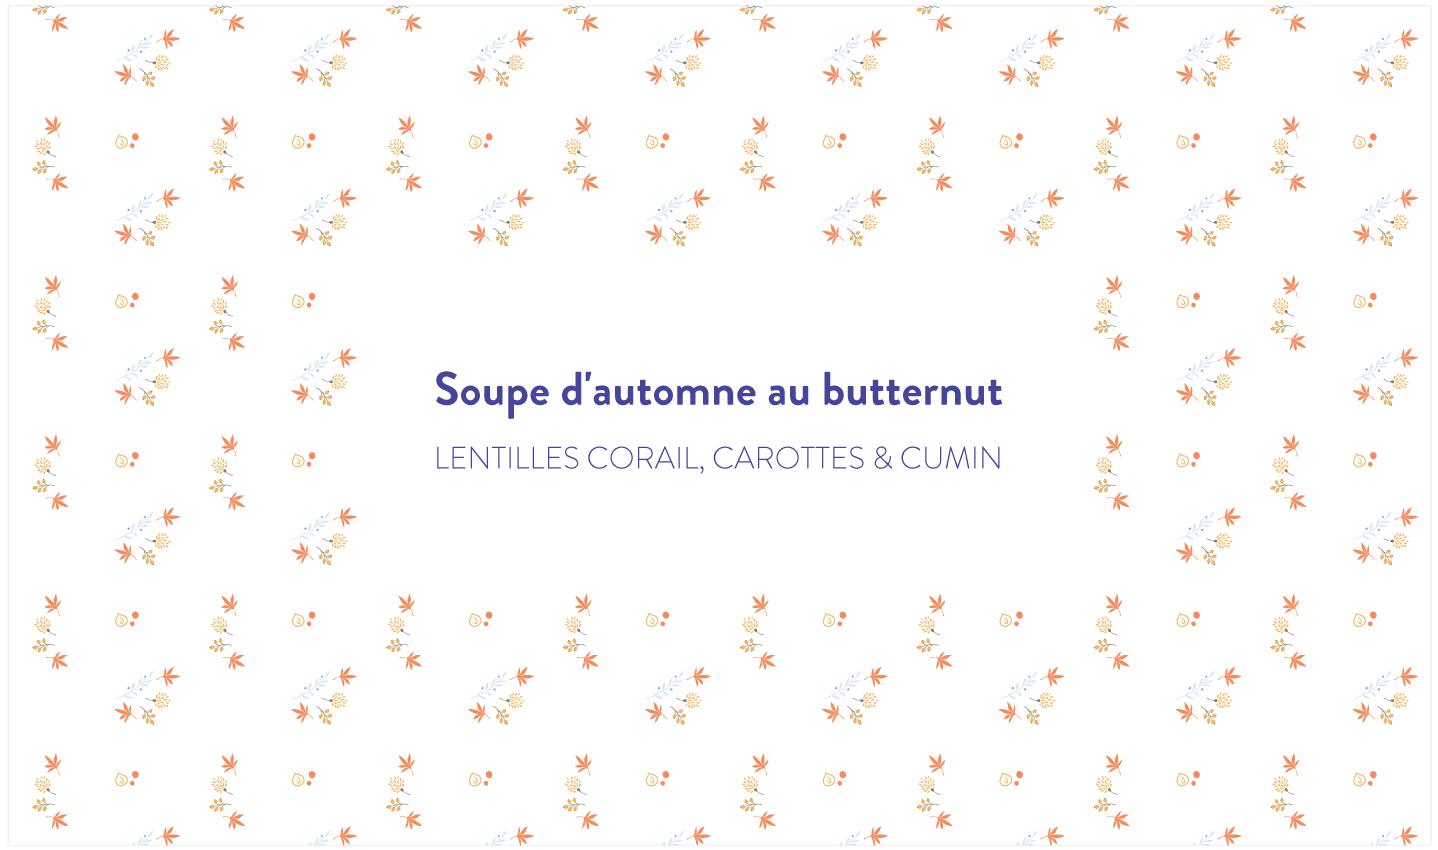 motifs-2016-automne-soupe-butternut